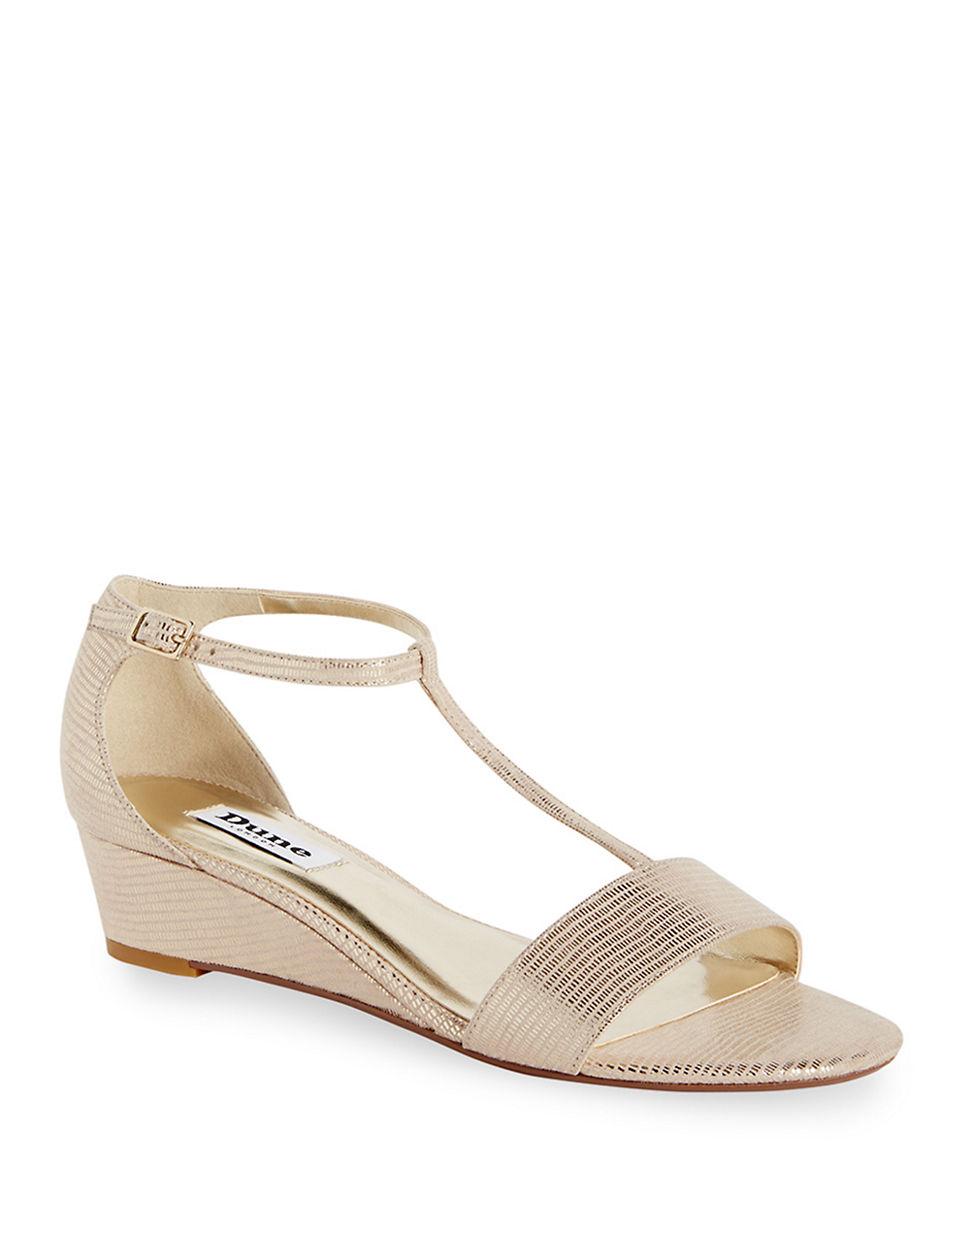 dune kaira t wedge sandals in beige gold lyst